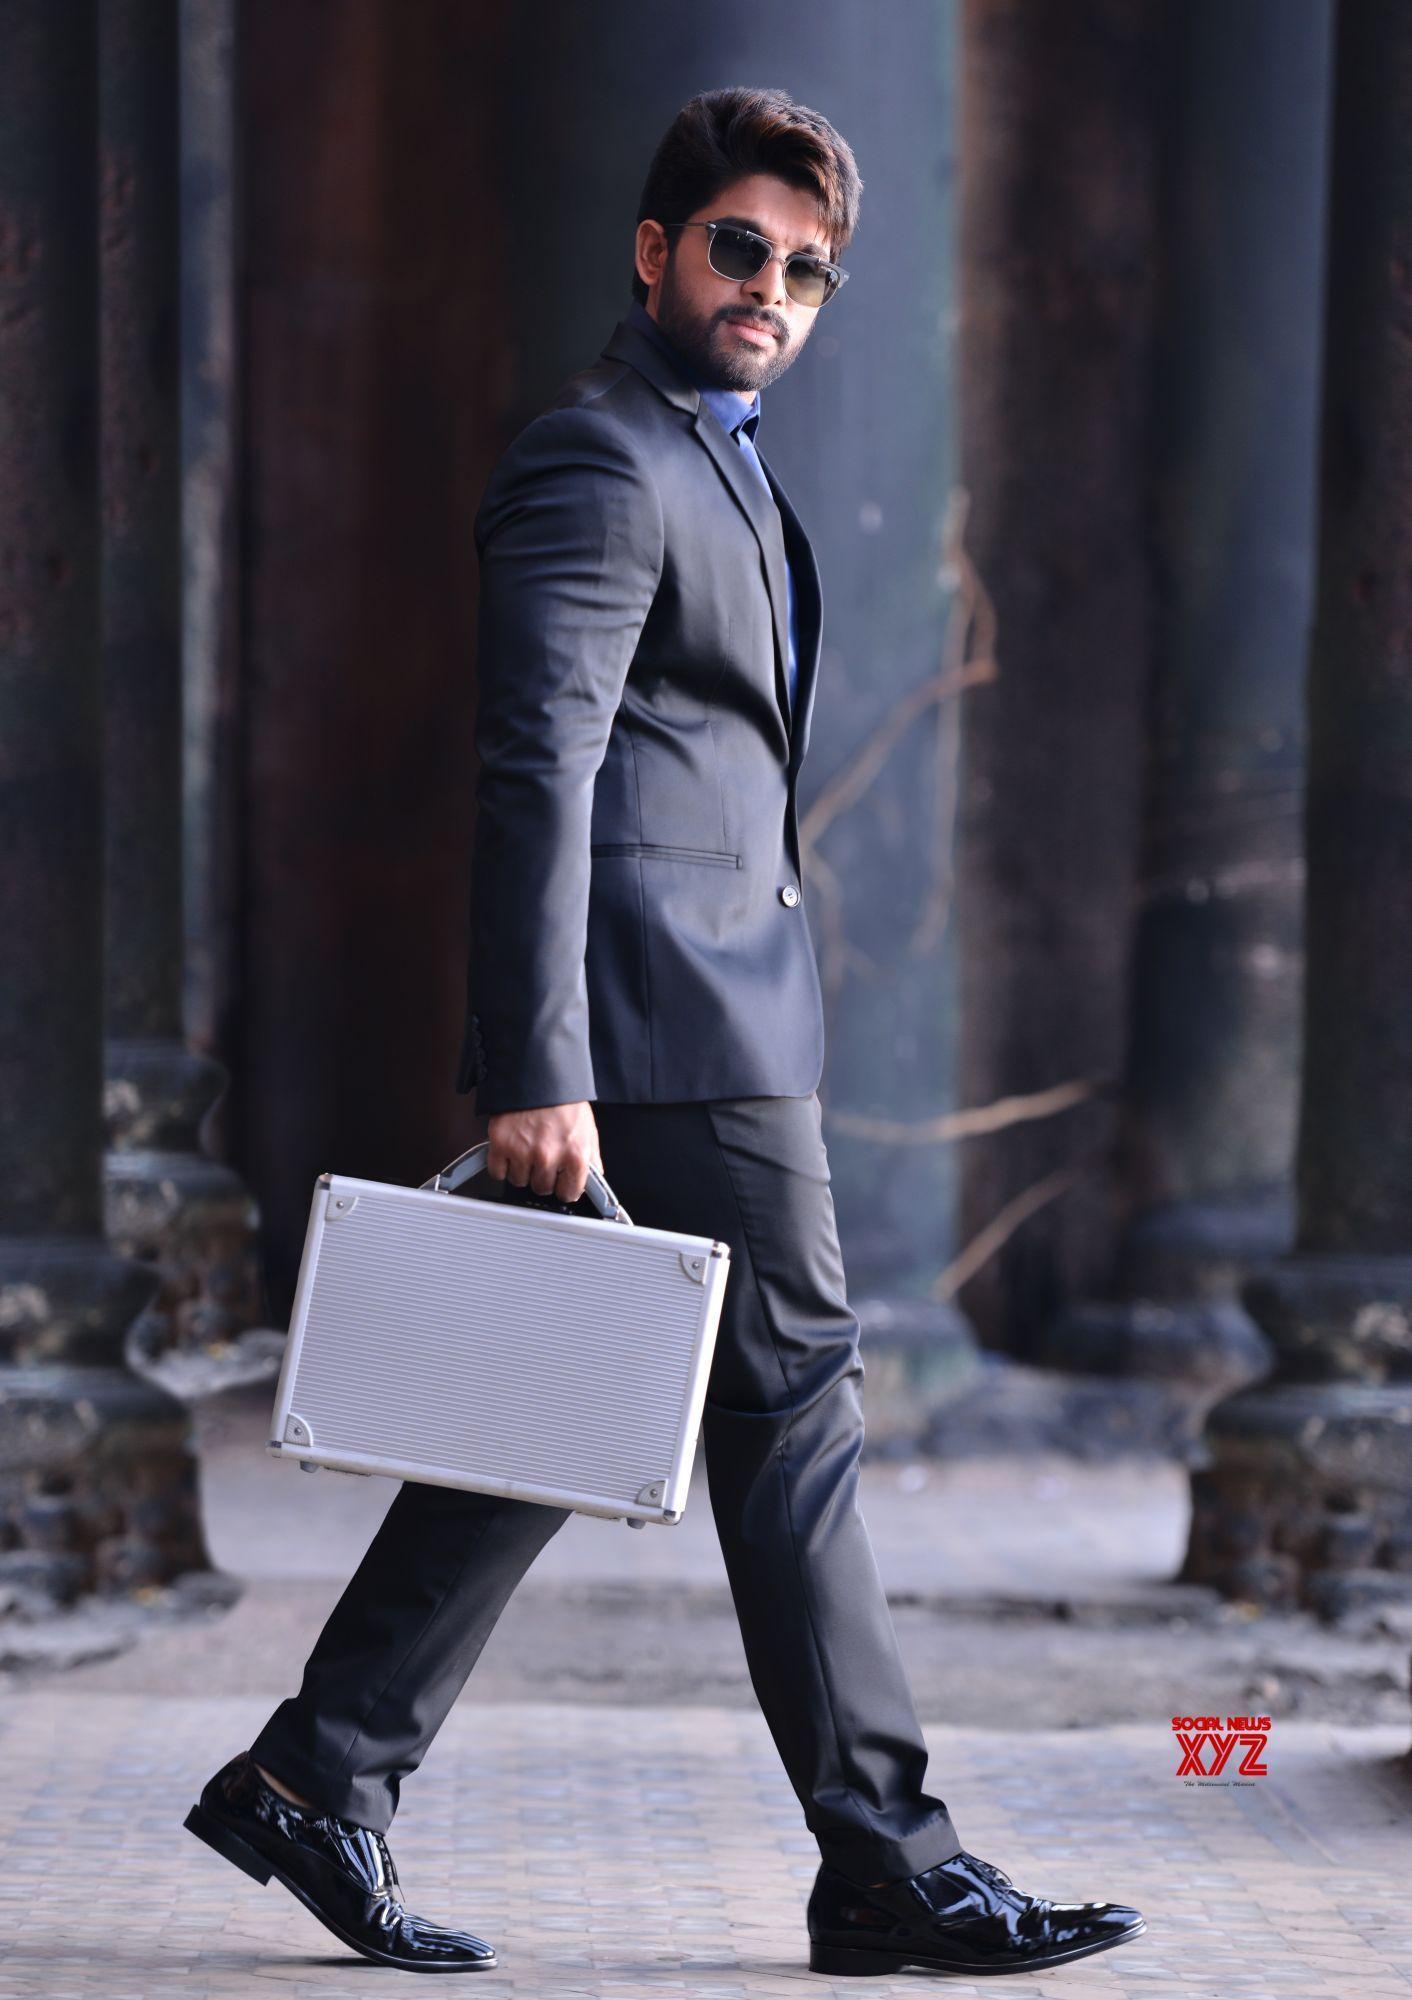 Dj Duvvada Jagannadham Movie Stills Social News Xyz Allu Arjun Wallpapers Dj Movie Latest Hd Wallpapers